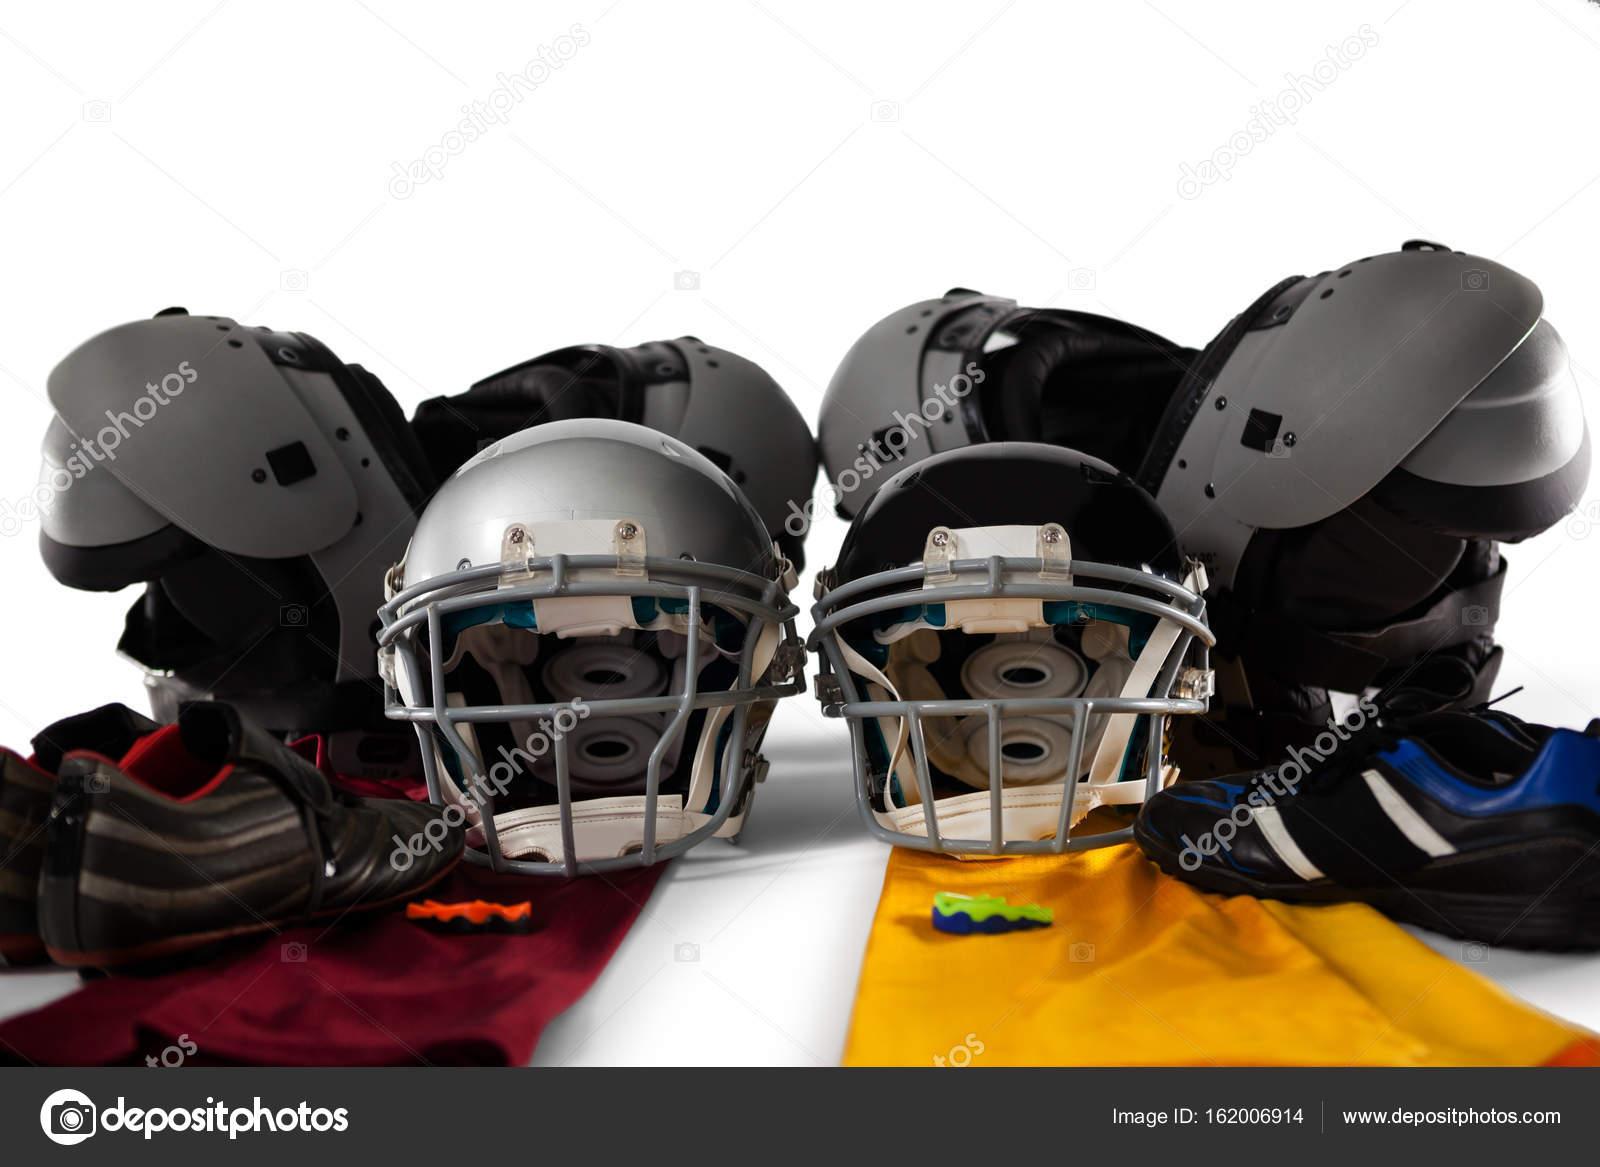 Brustschutz mit Sport Getriebe — Stockfoto © Wavebreakmedia